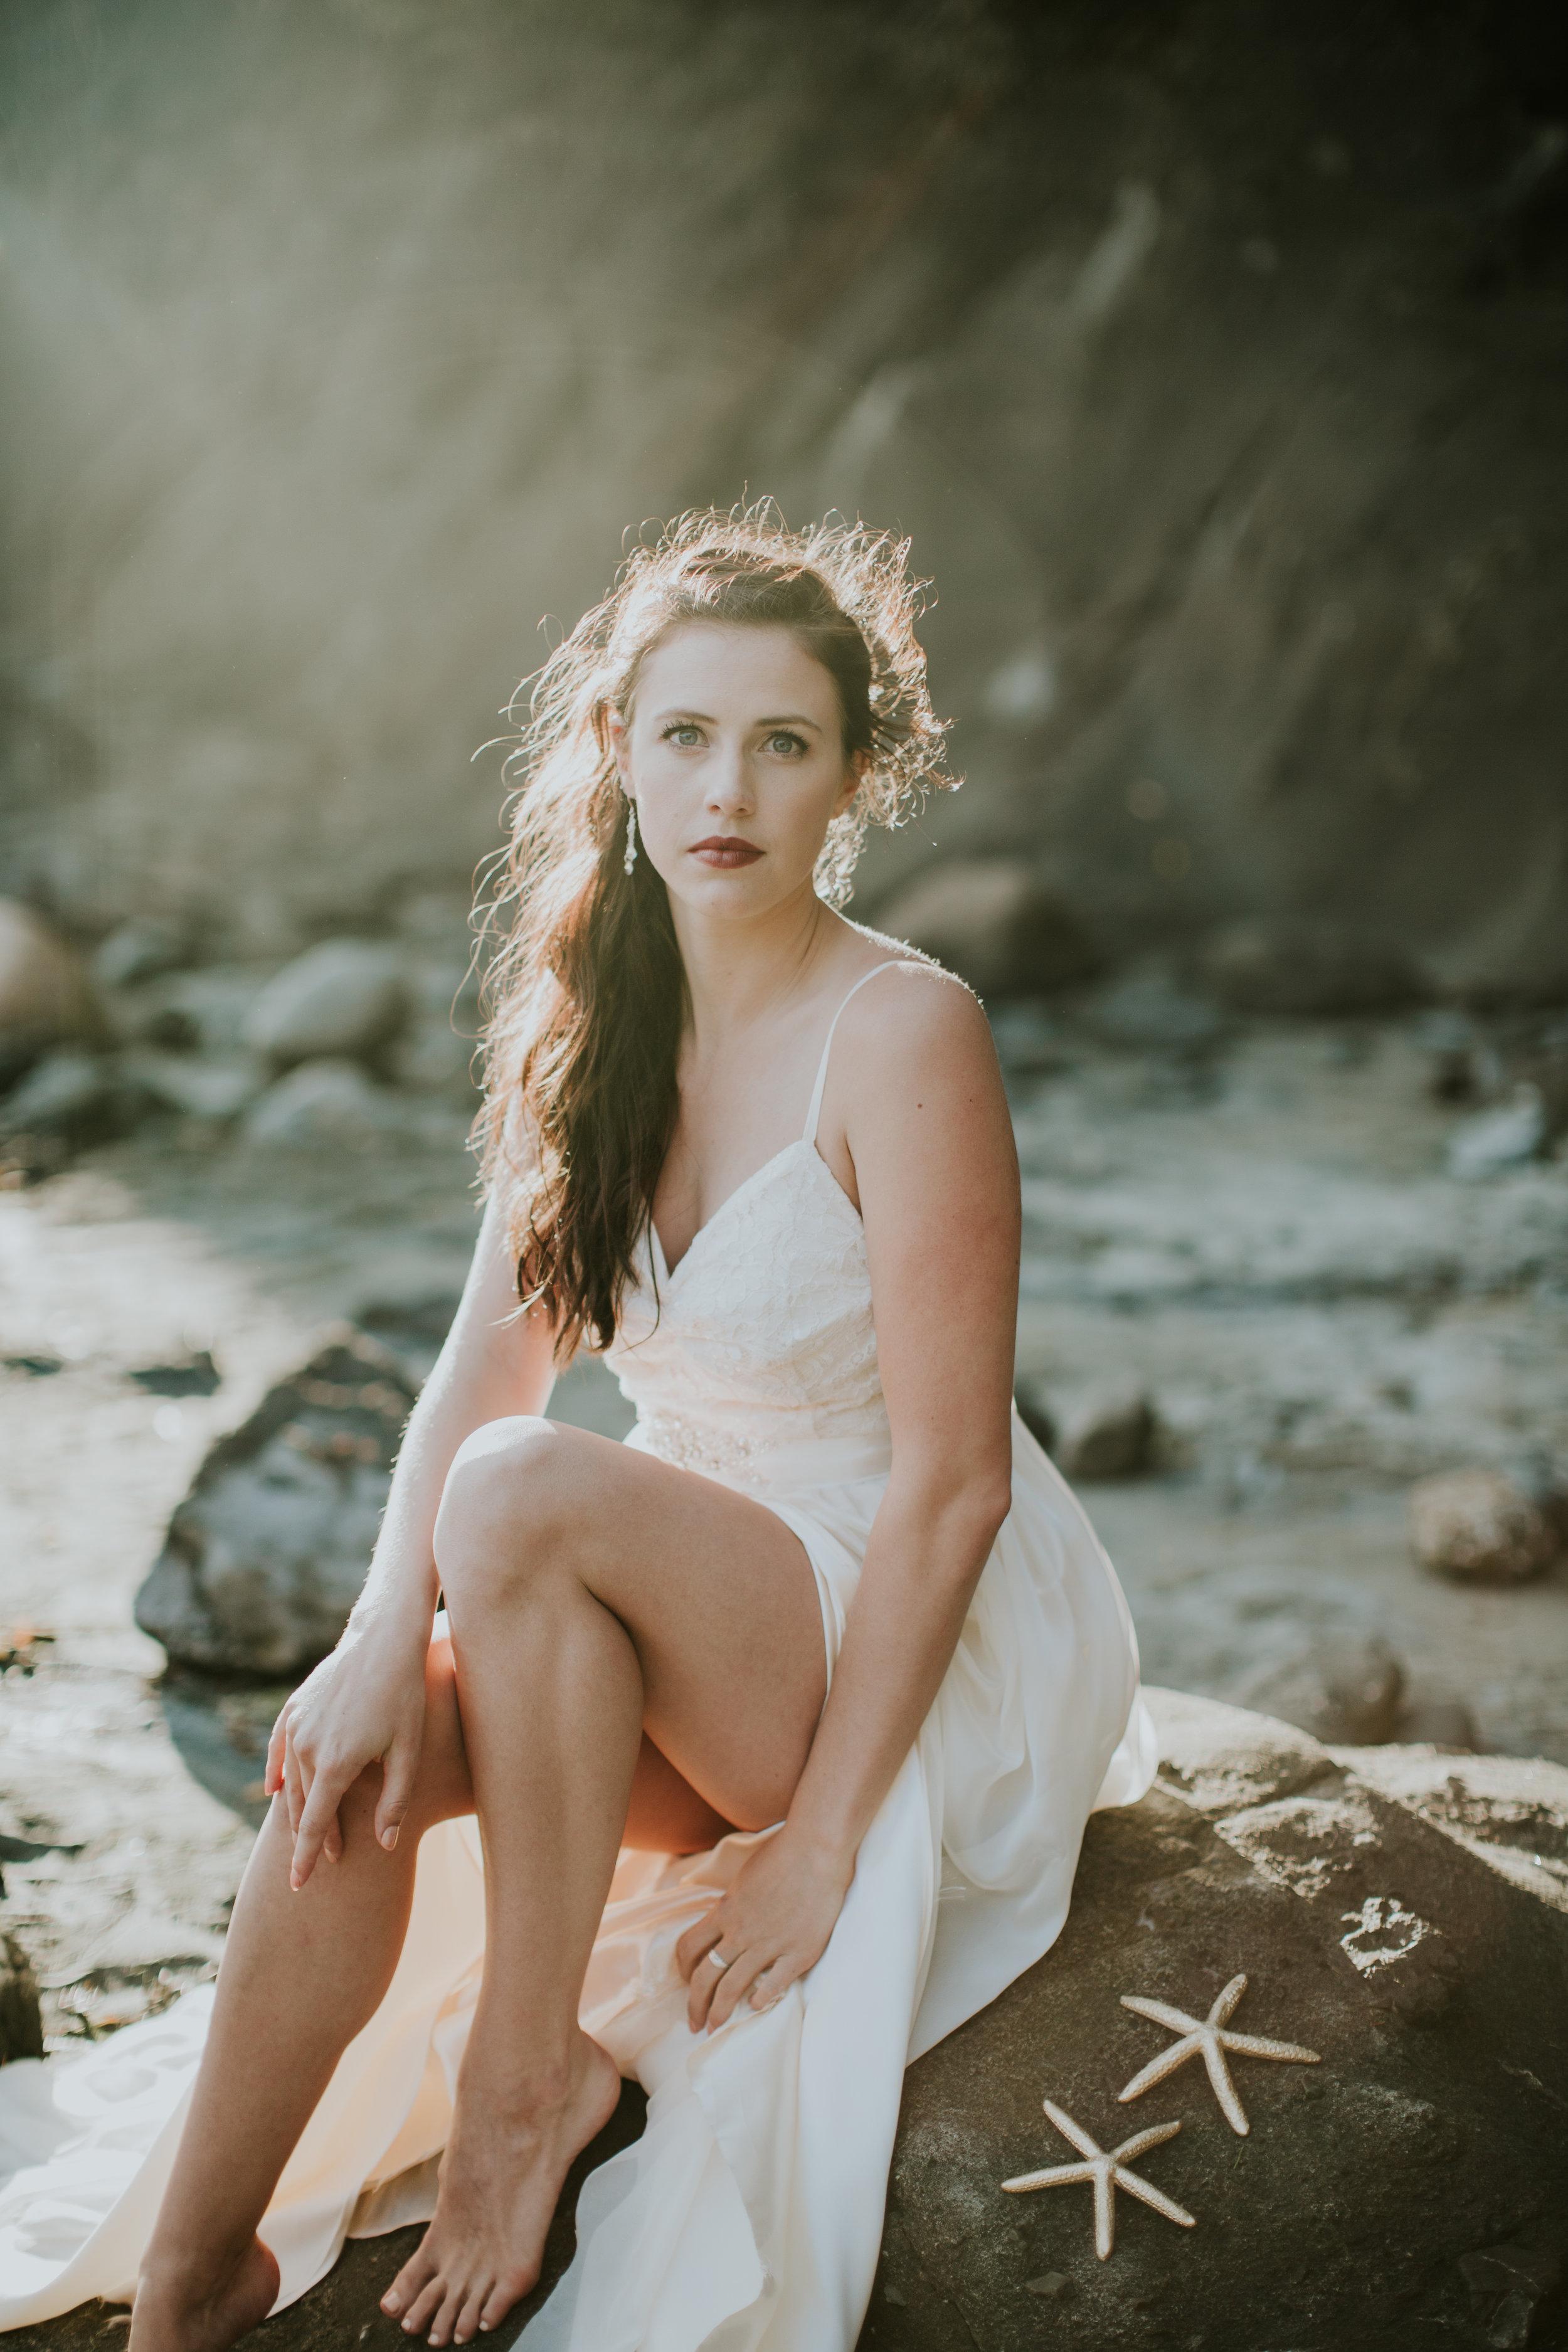 Port-Angeles-Salt-Creek-beach-wedding-bride-PNW-olympic-peninsula-photographer-Kayla-Dawn-Photography-outdoors-golden-hour-dancer-dress (23).jpg